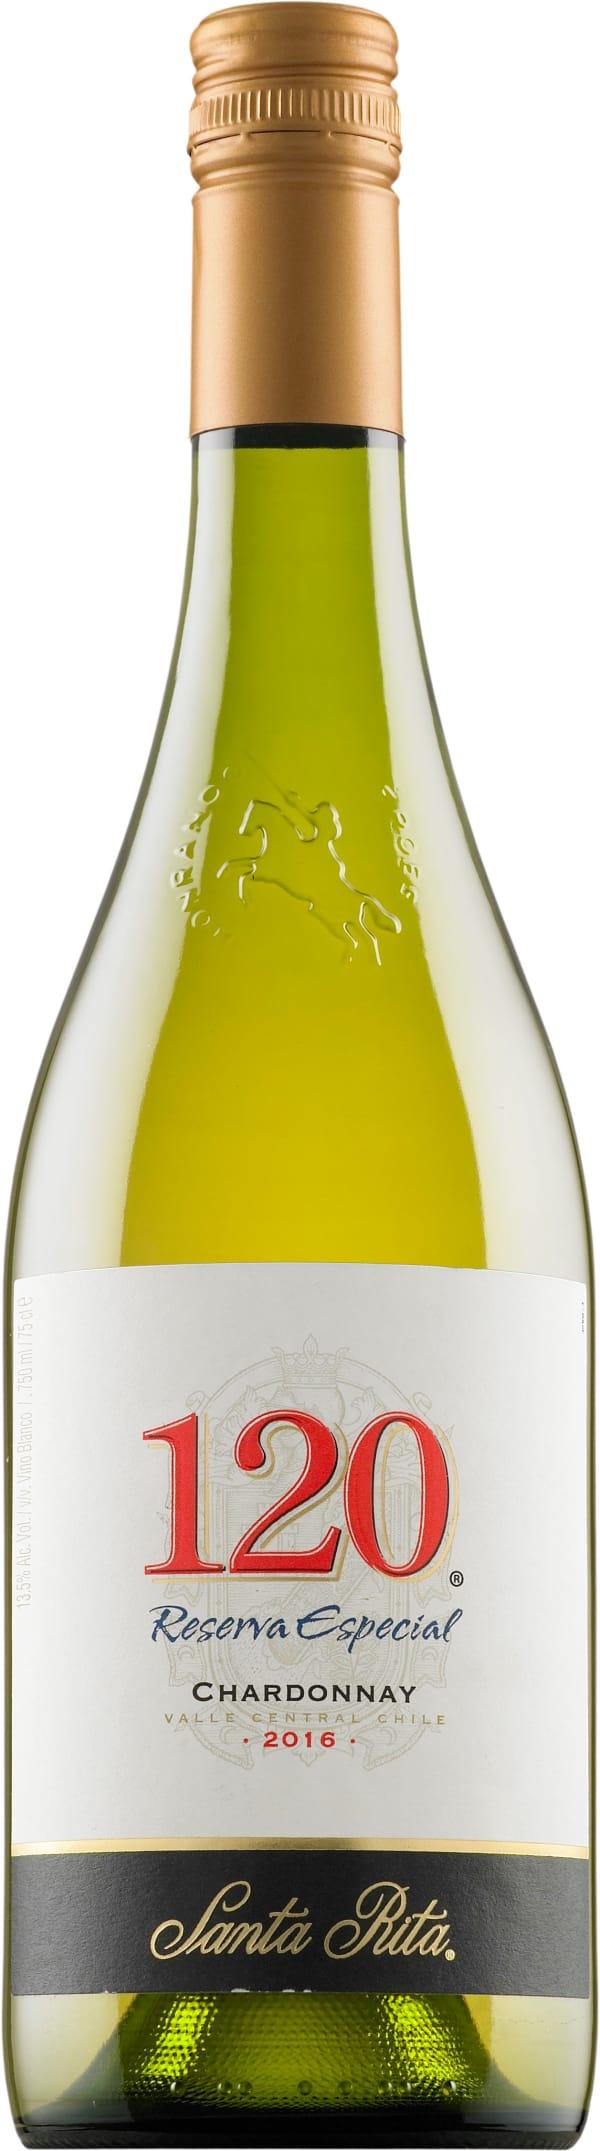 Santa Rita 120 Chardonnay 2018